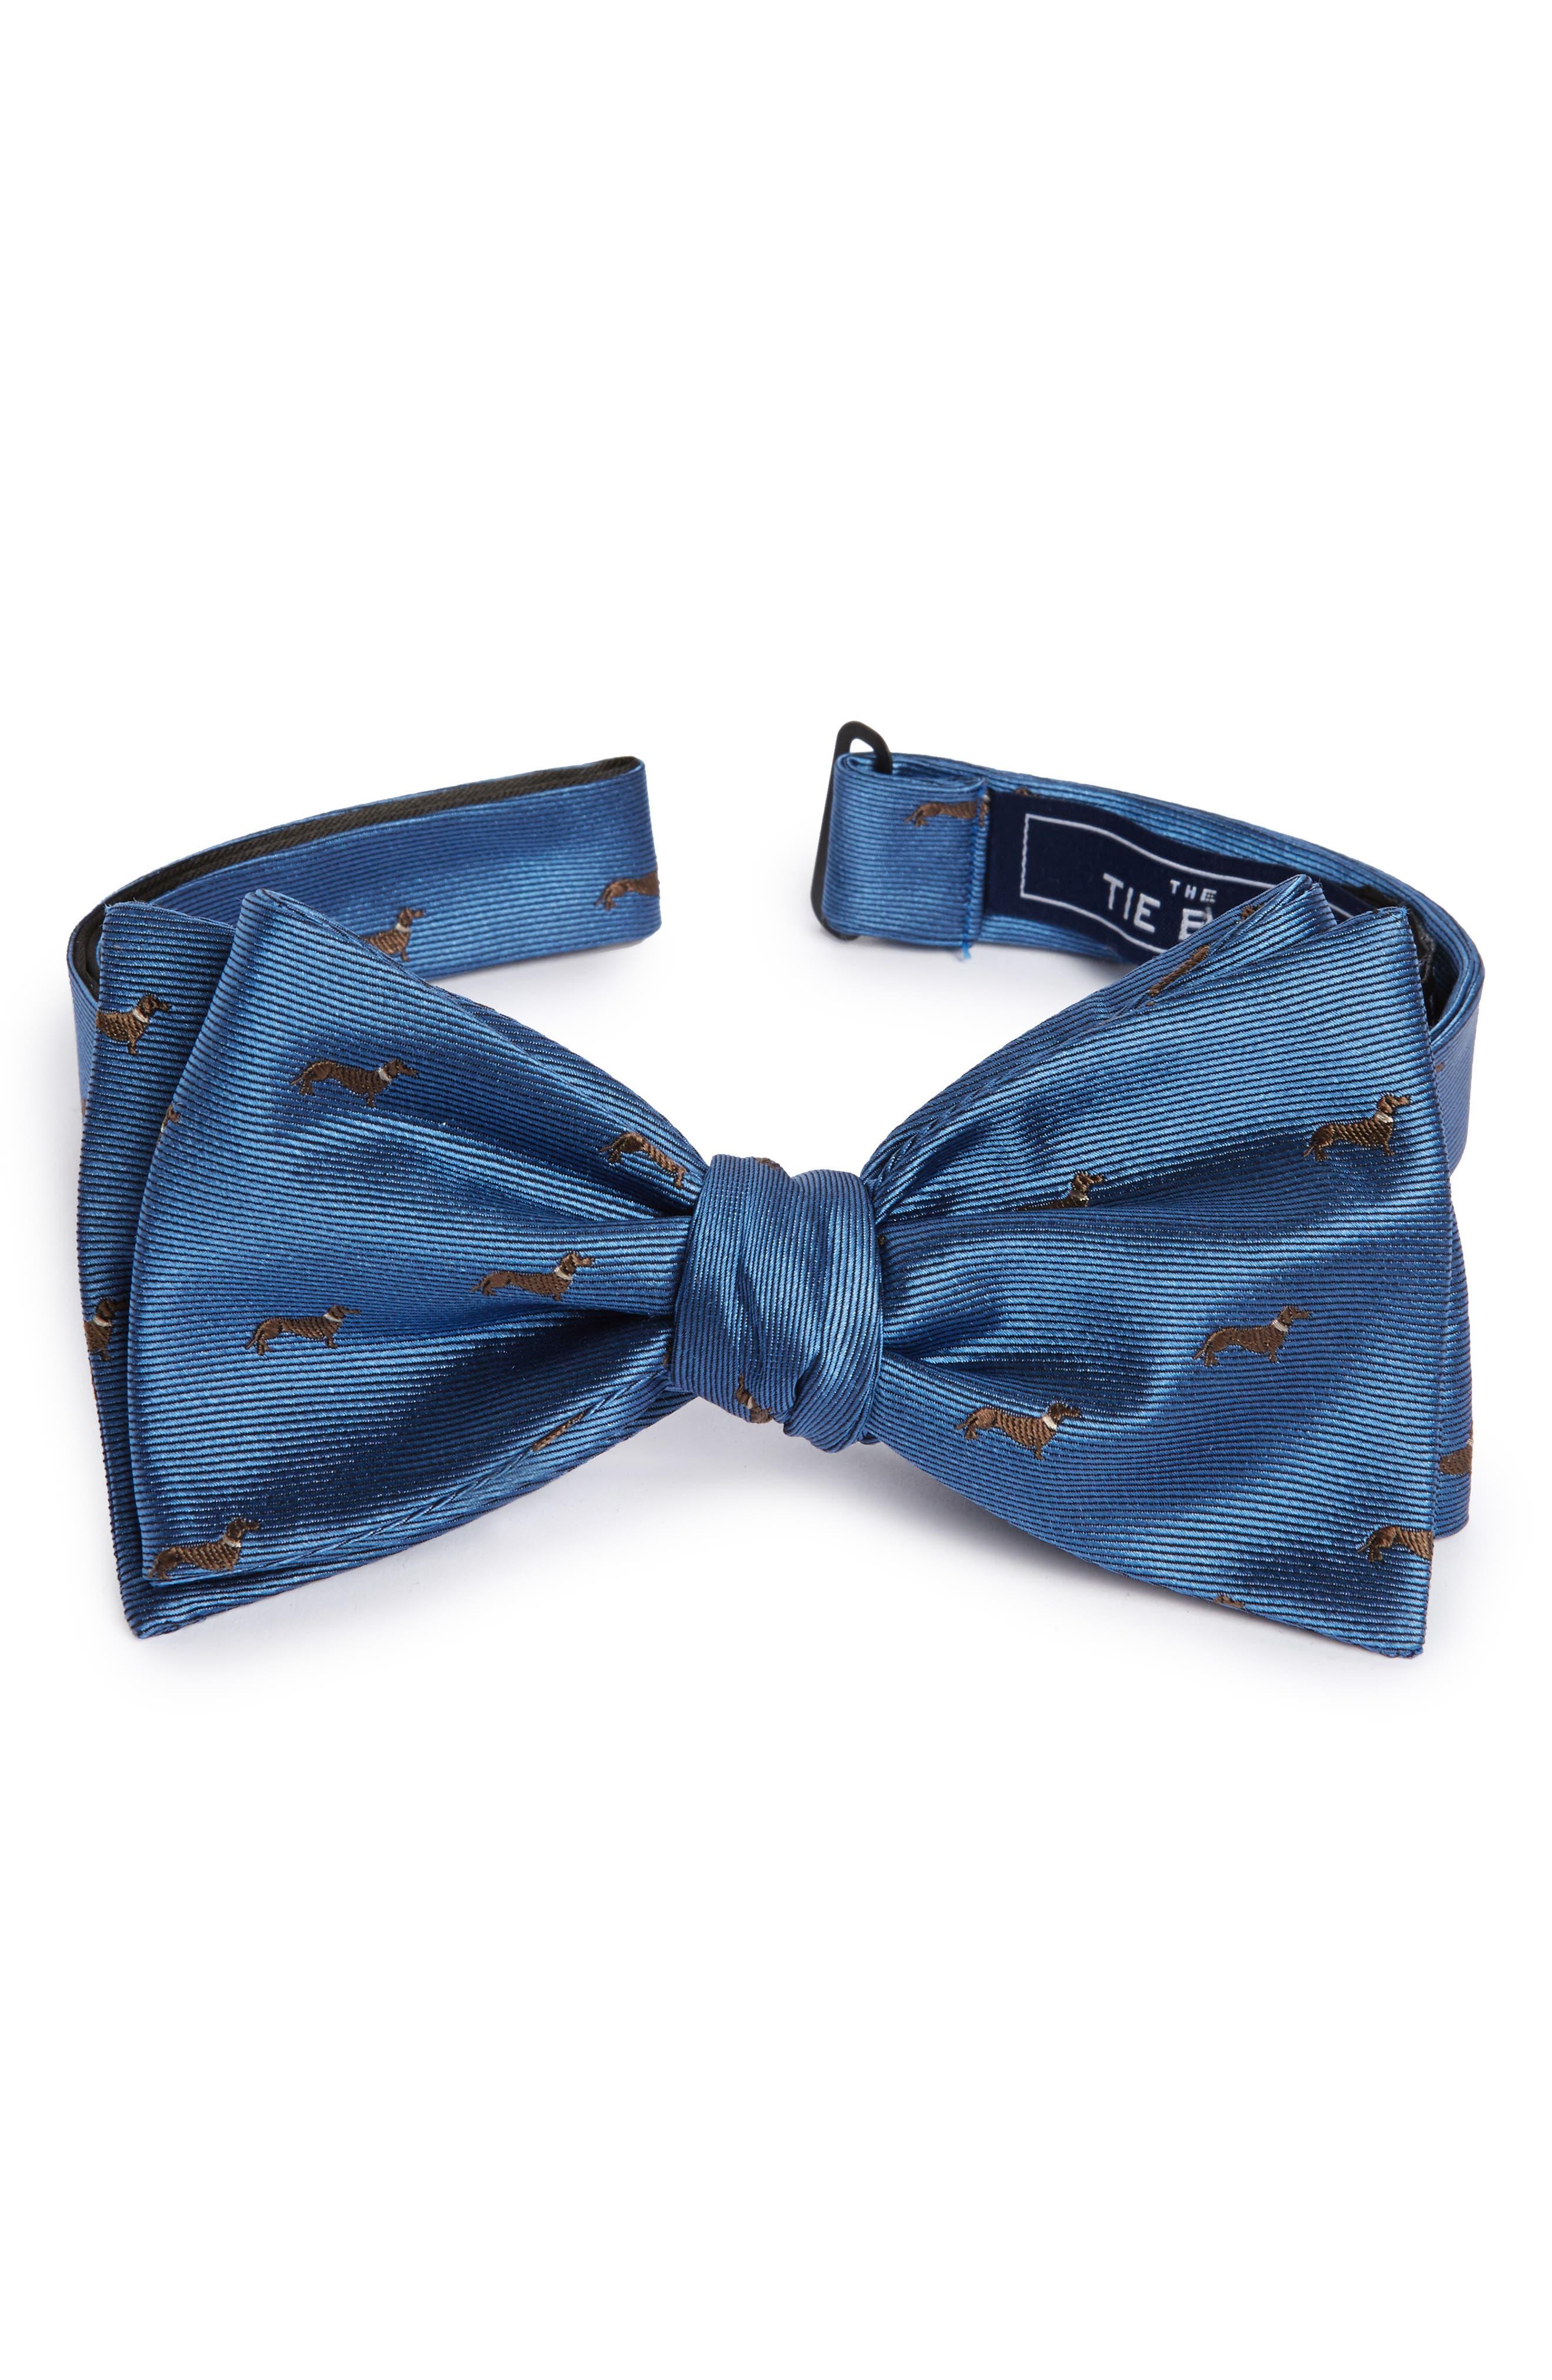 The Tie Bar Dog Days Silk Bow Tie